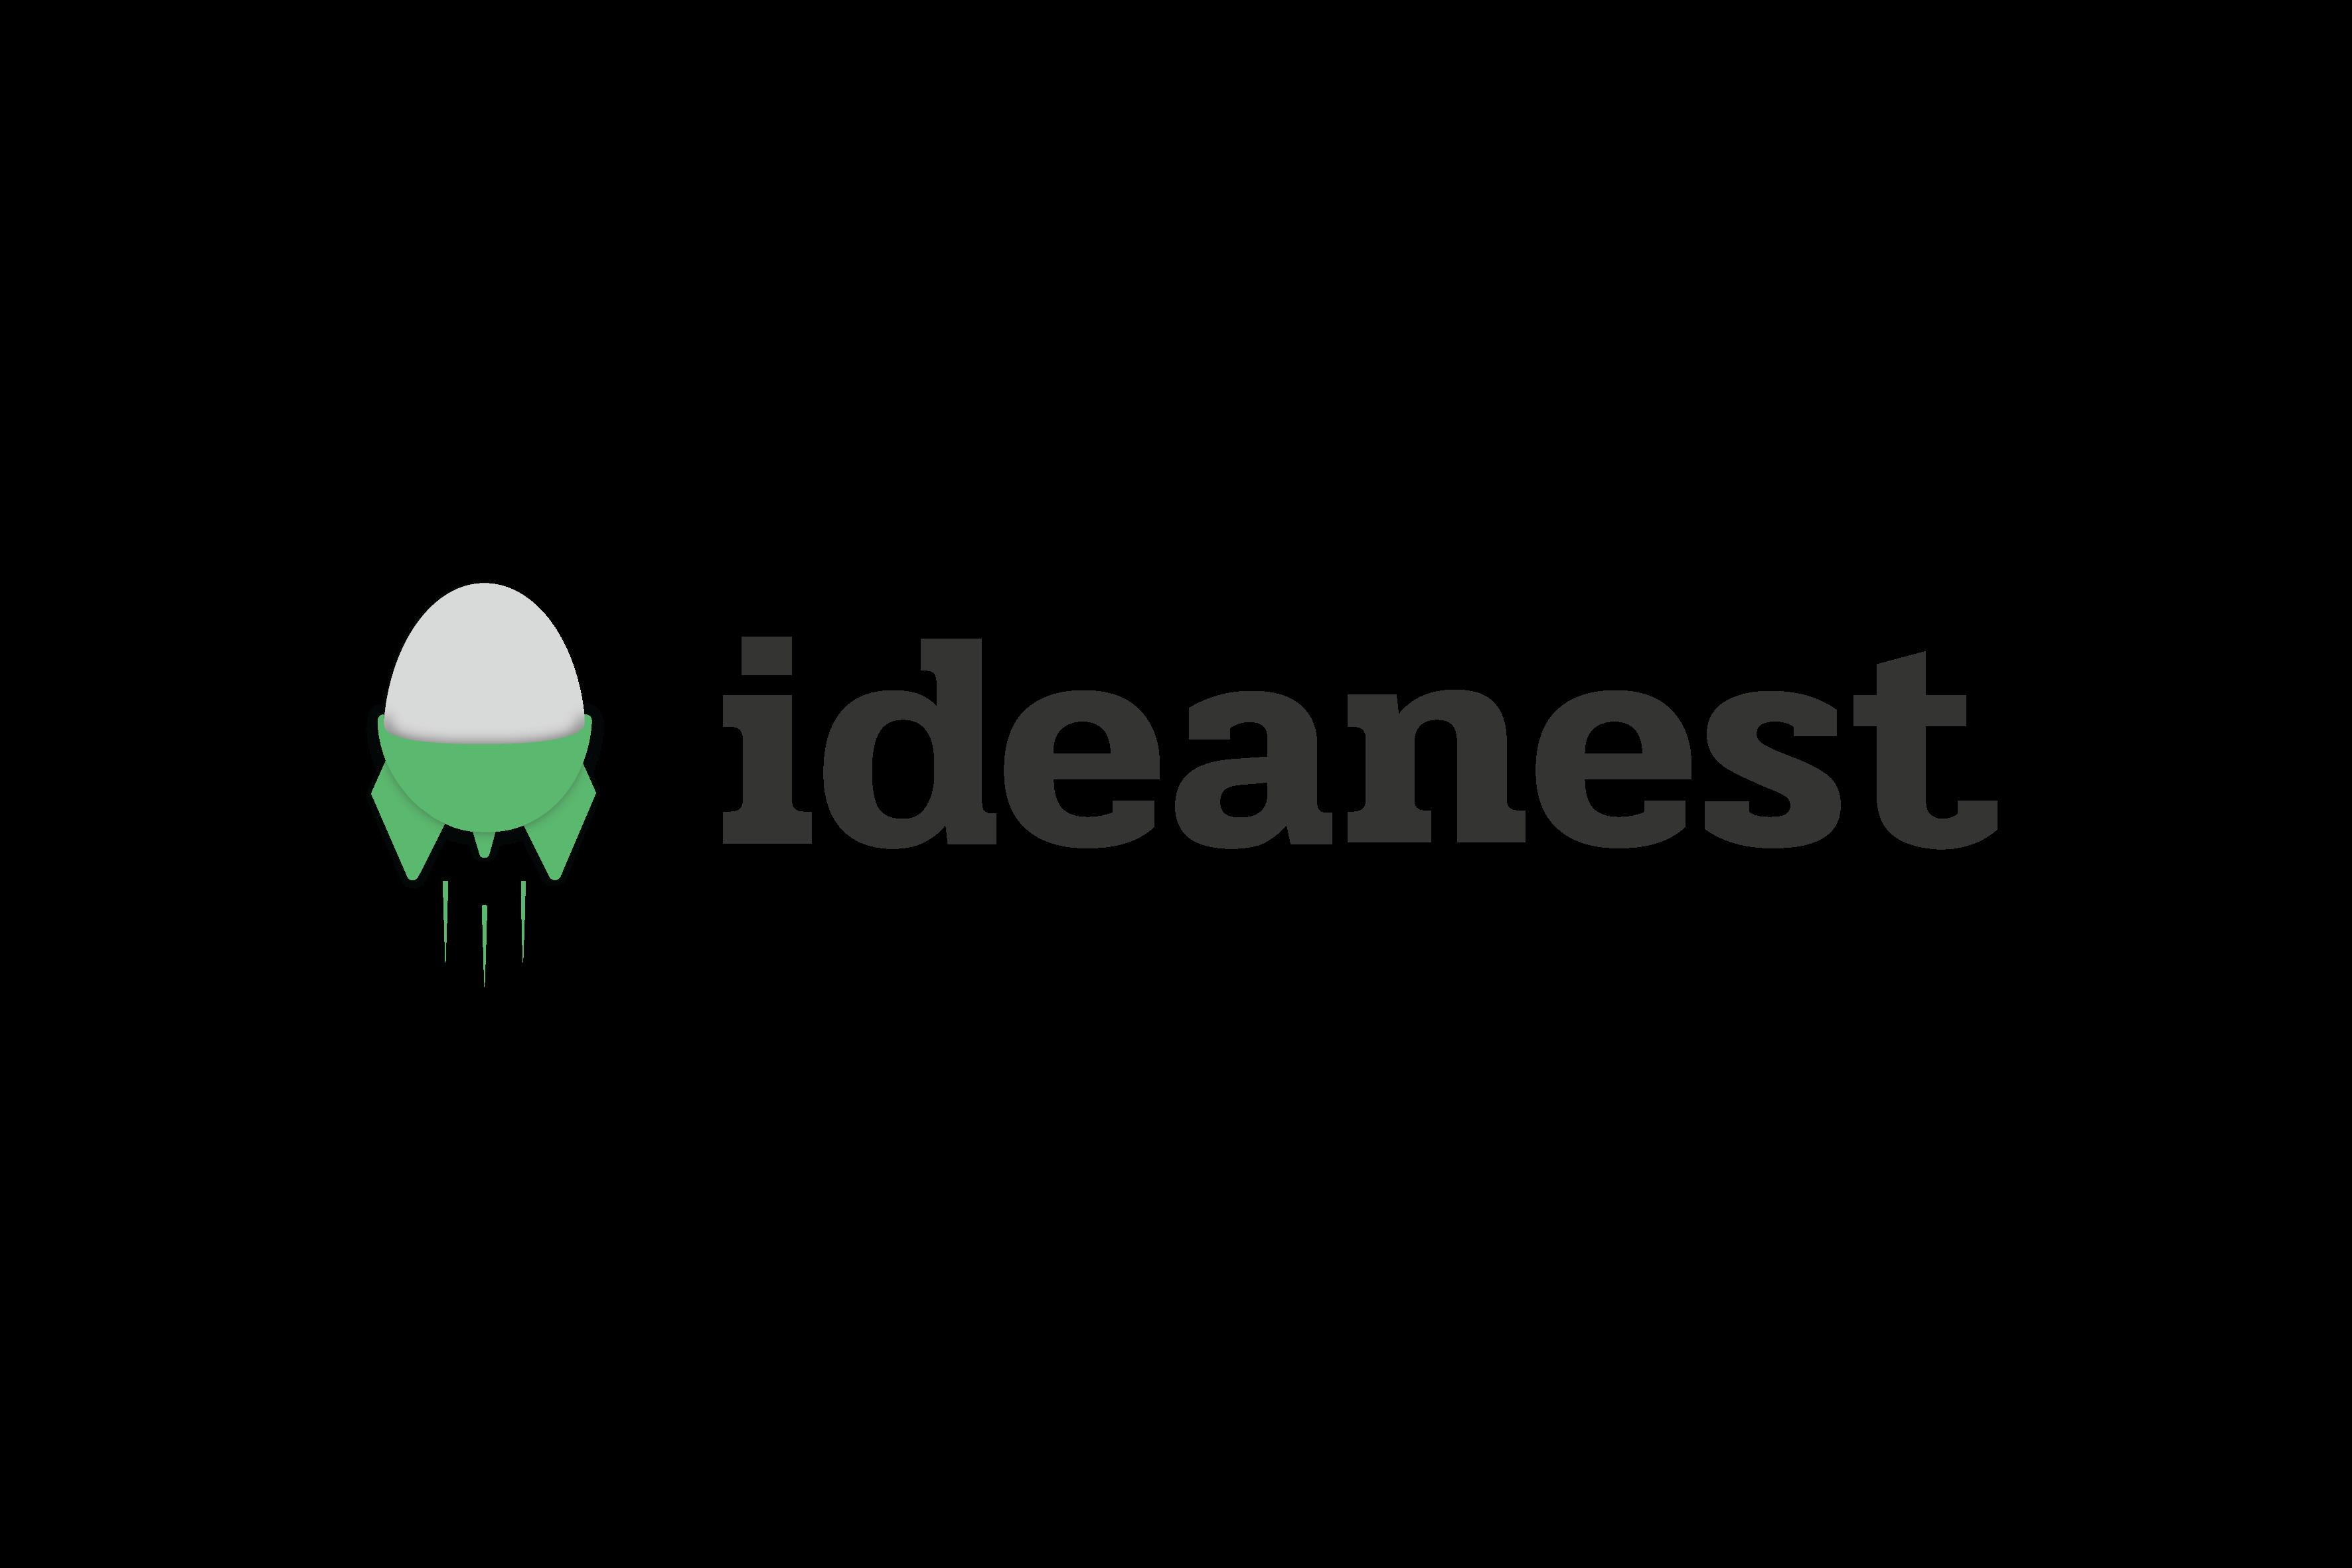 ideanest logo